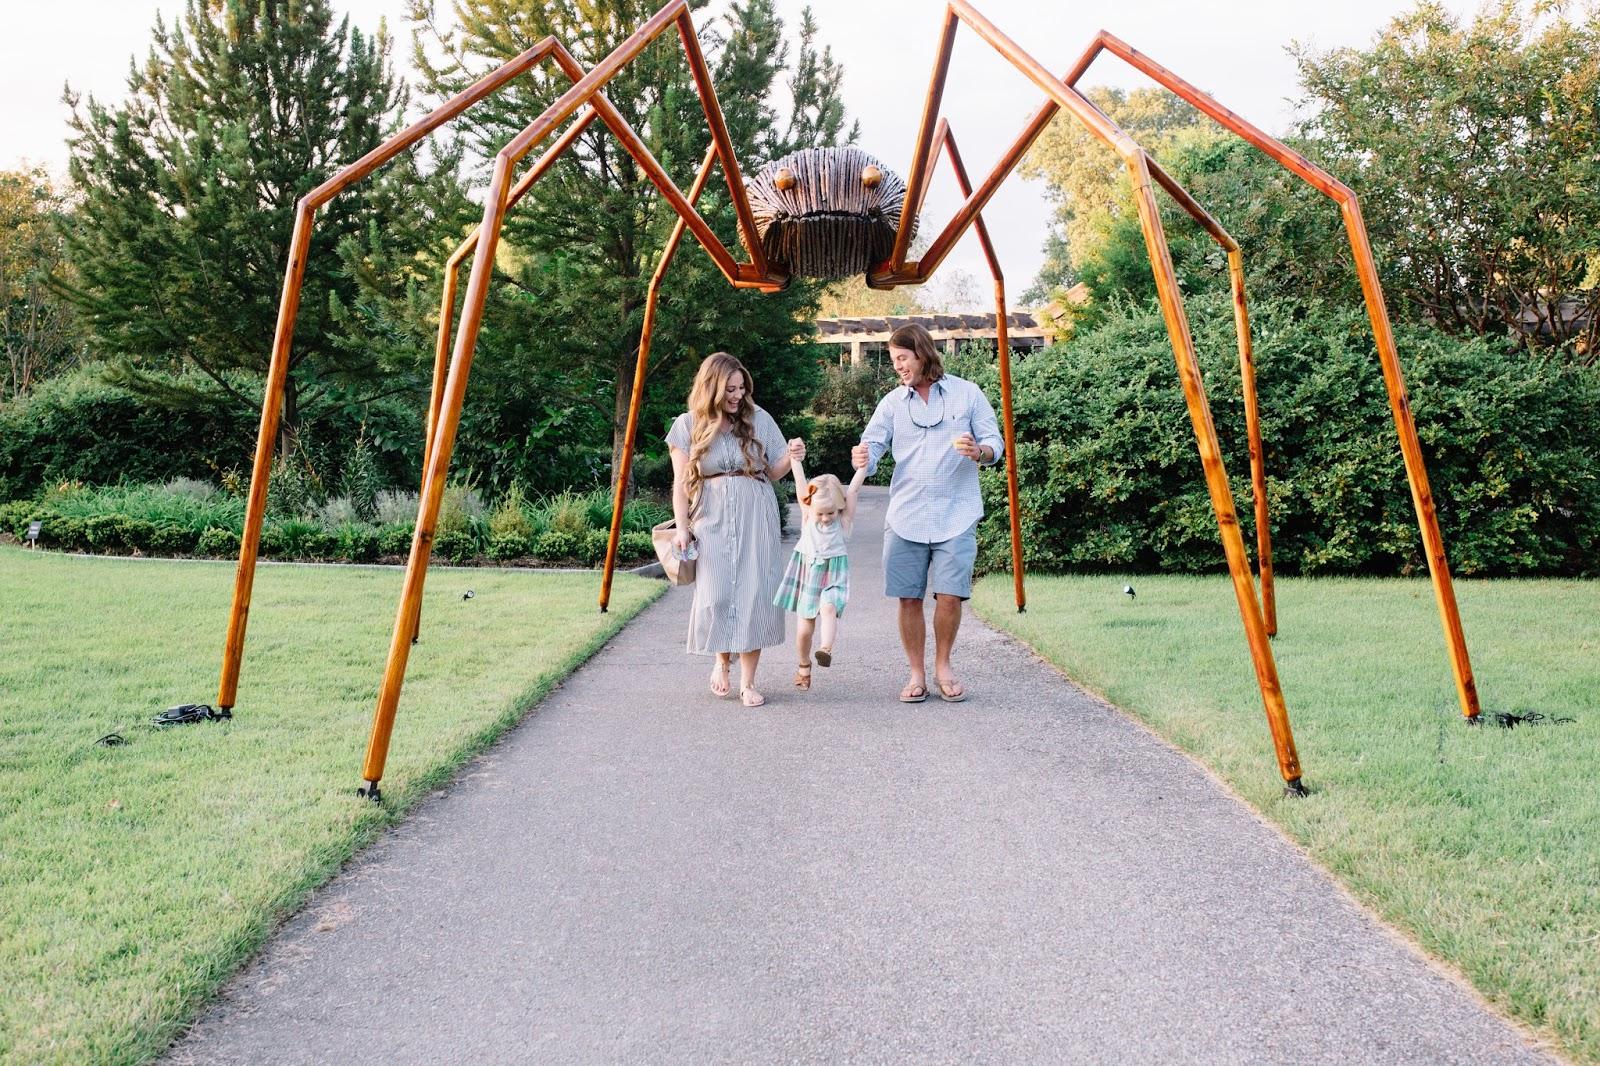 Memphis Botanic Garden Big Bugs by Terminix by East Memphis Mom blogger Walking in Memphis in High Heels